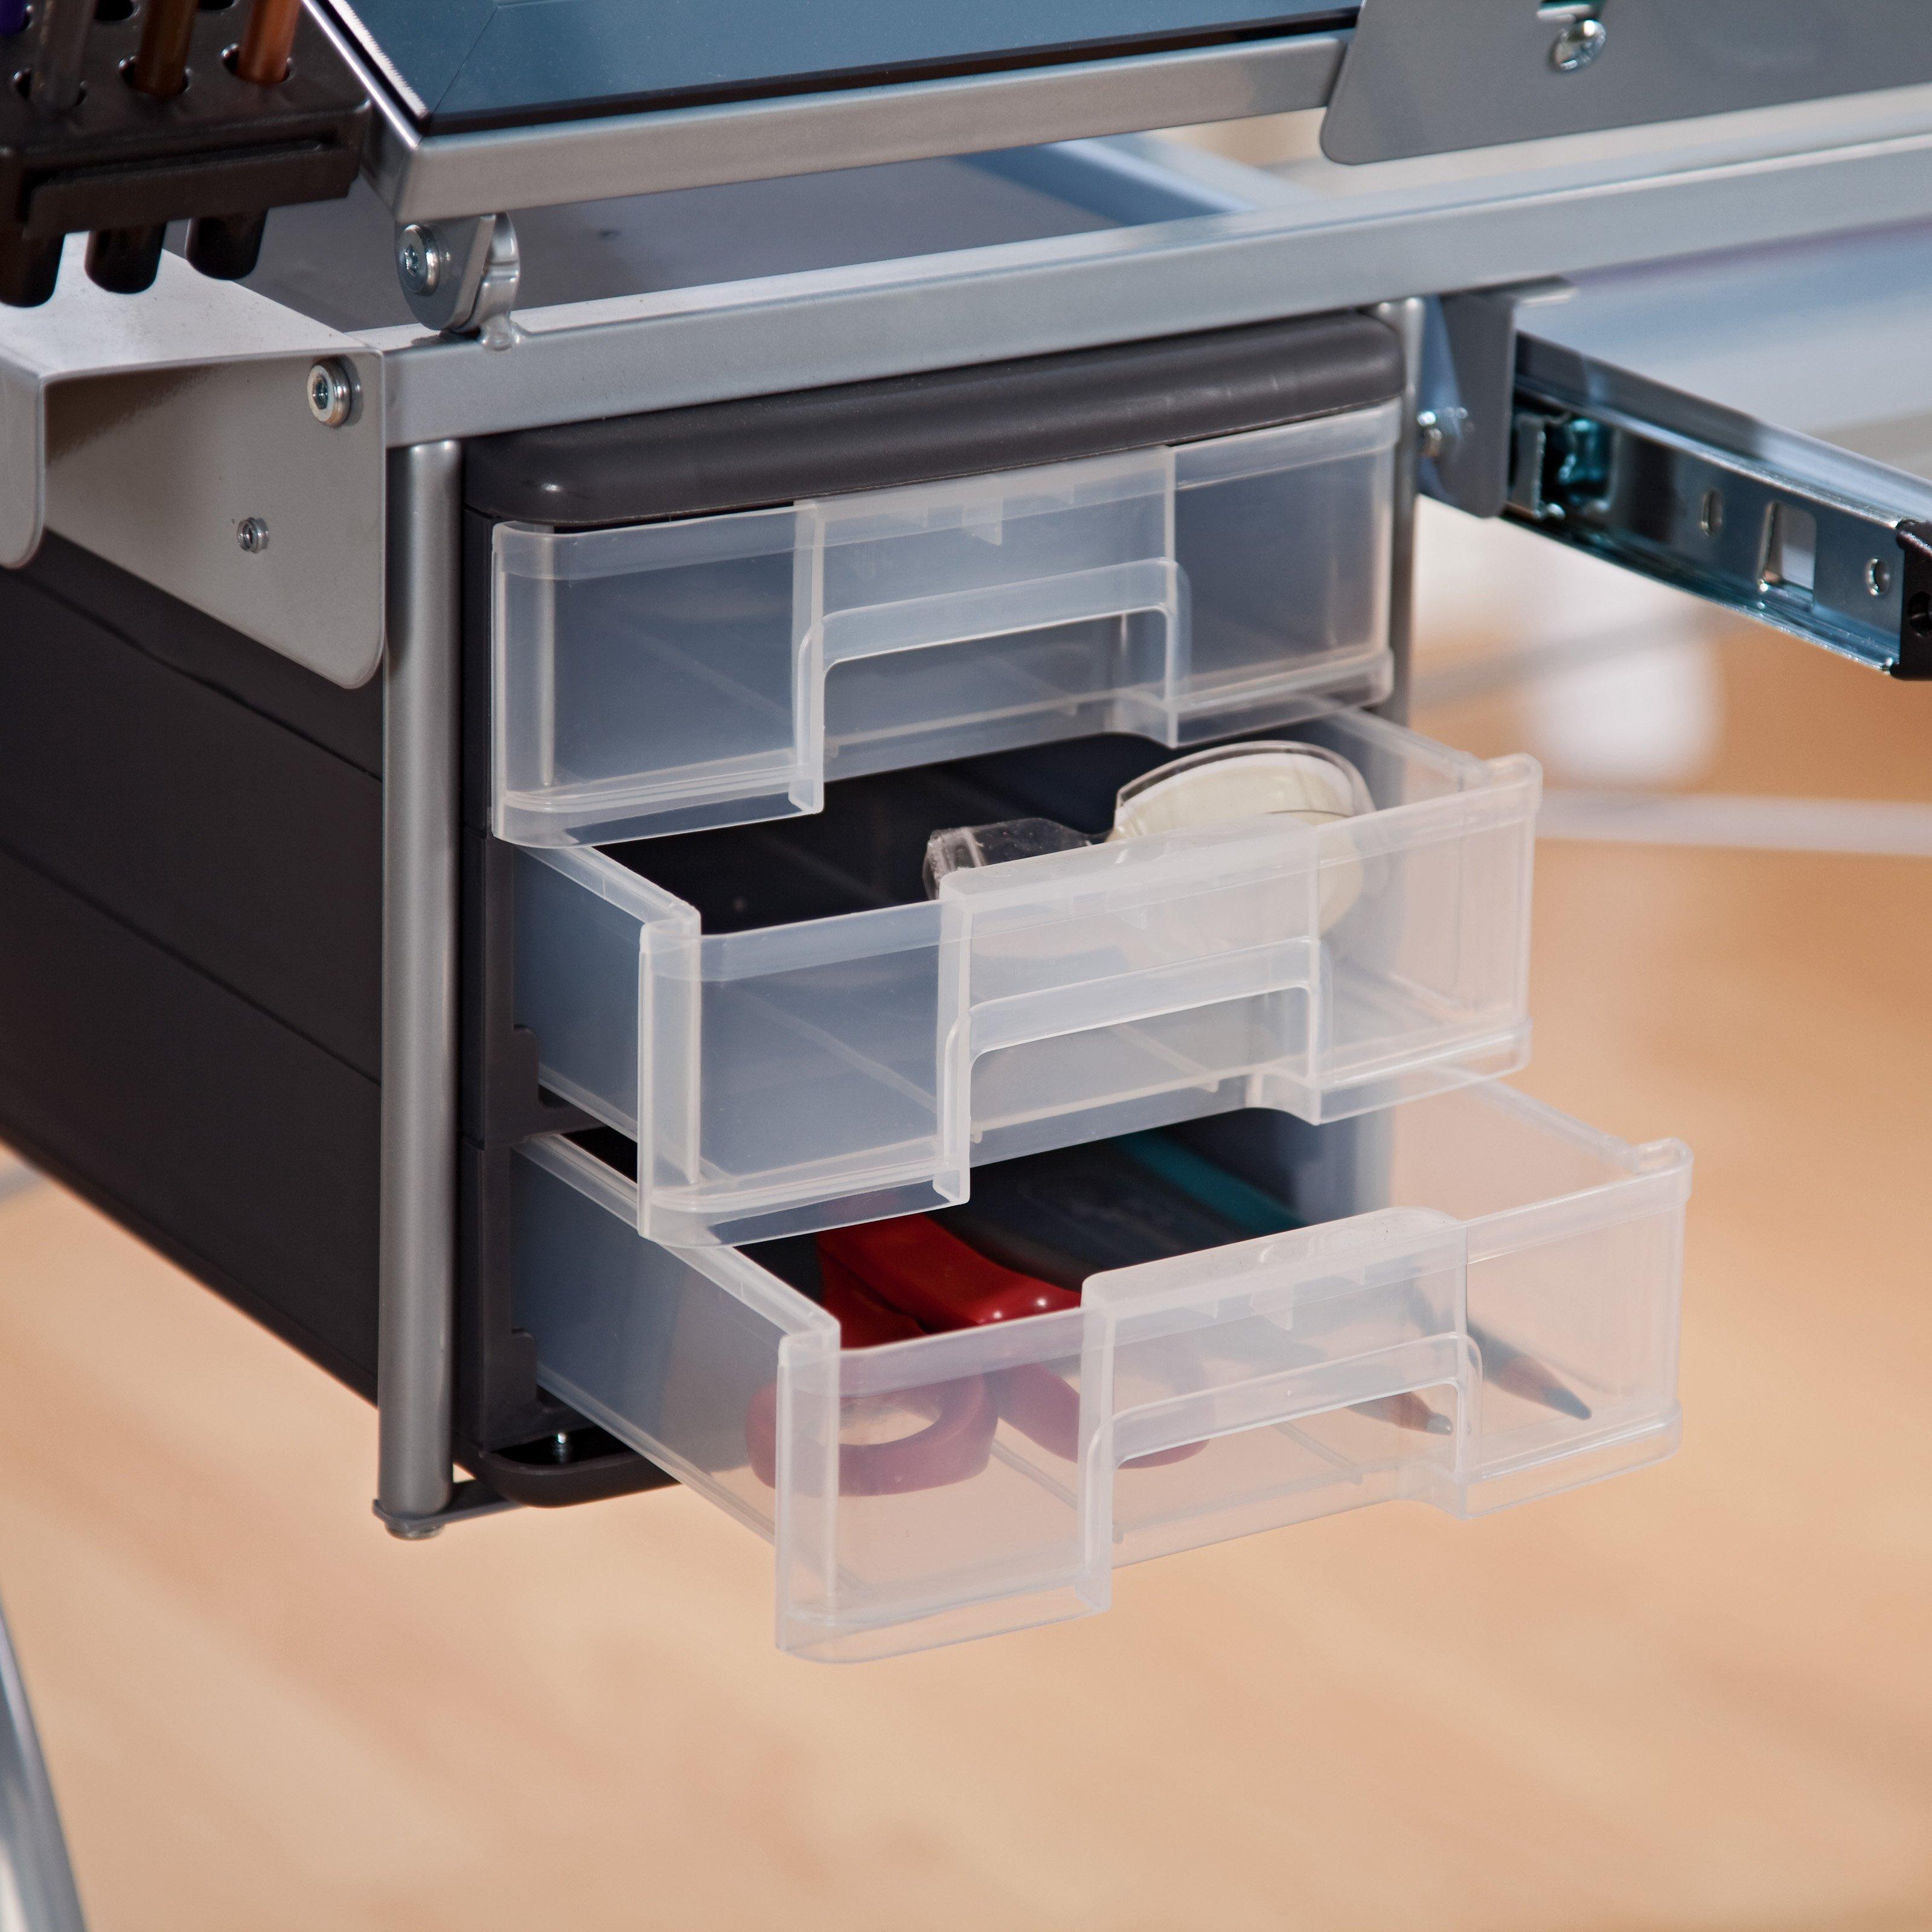 Studio designs futura craft station with glass top - Studio Designs Futura Craft Station With Glass Top 59